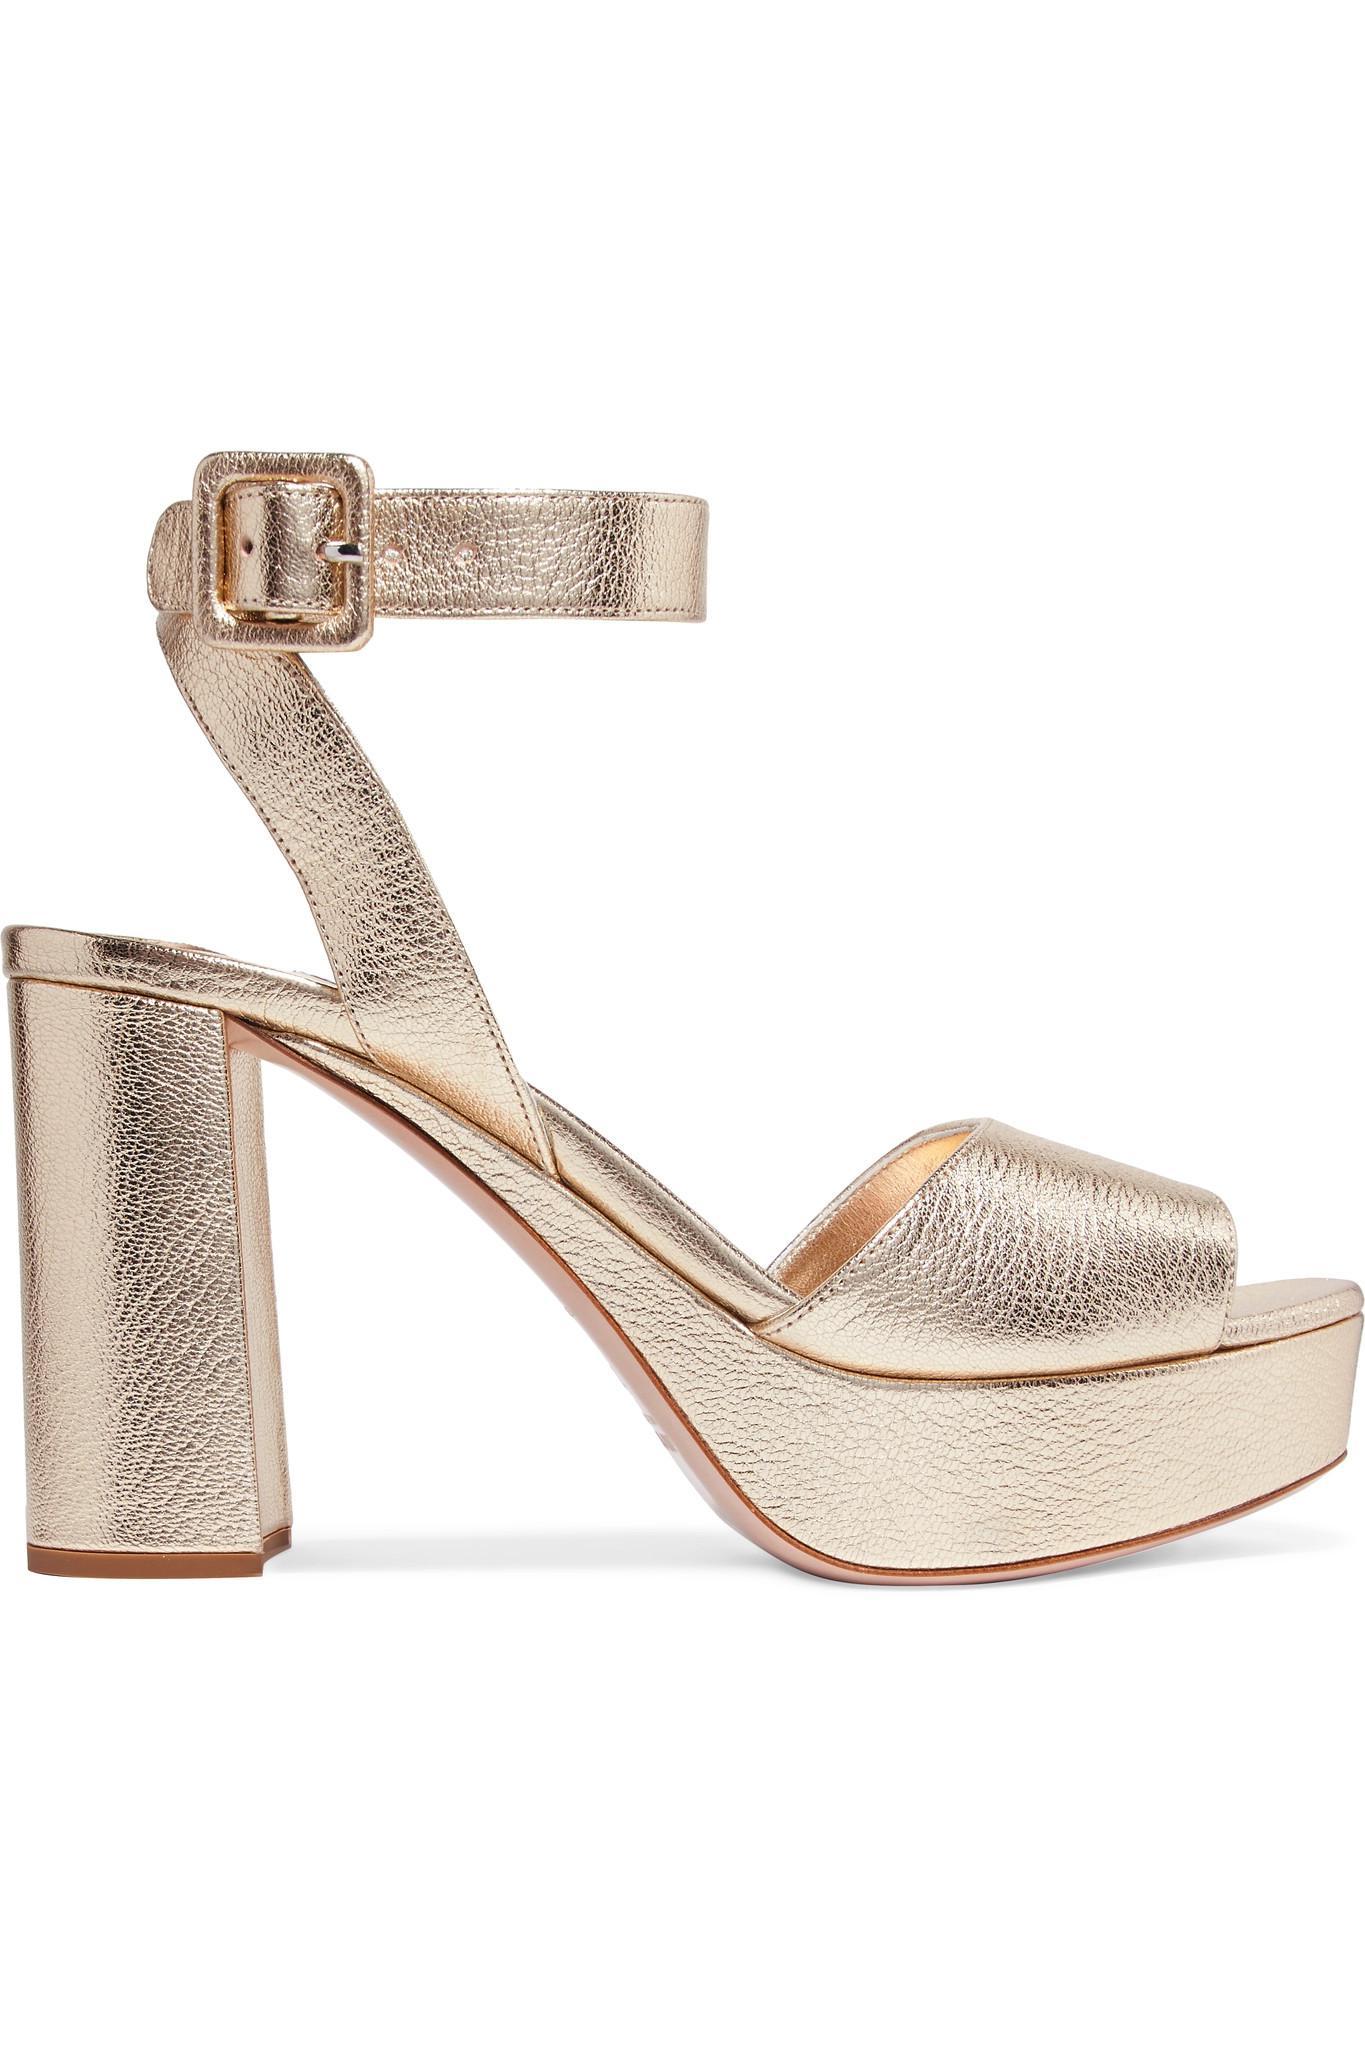 Sandales Plates-formes En Velours - ChocolatPrada w9X9sPunyV